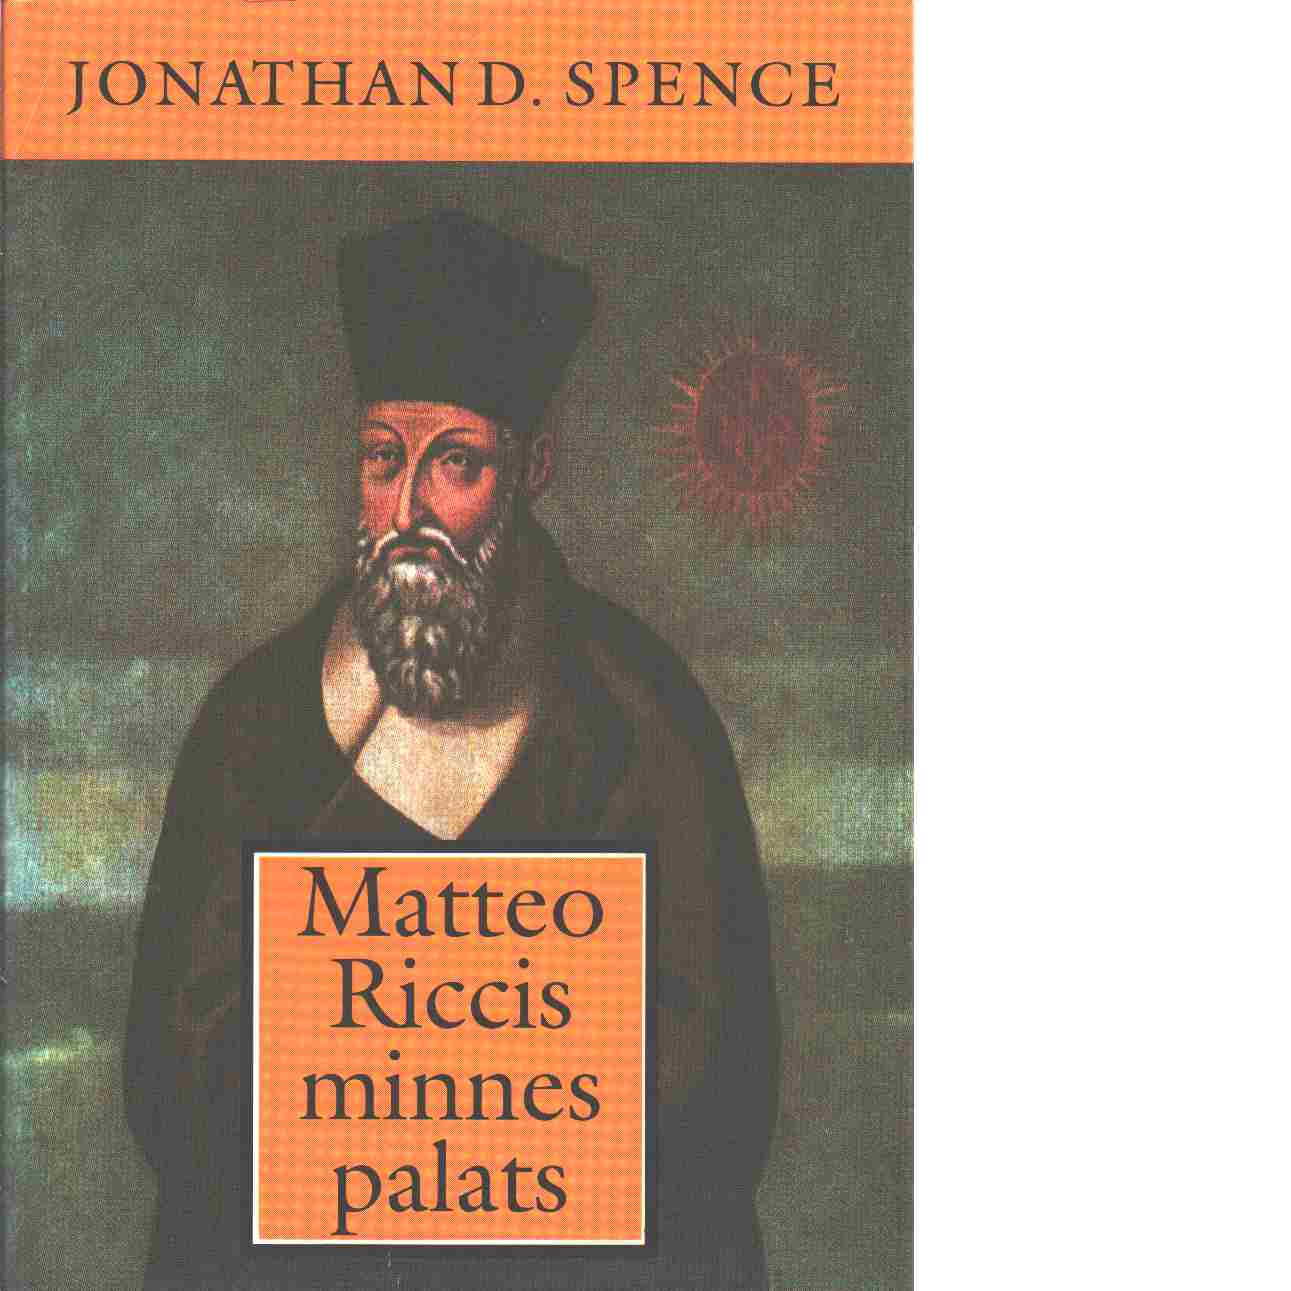 Matteo Riccis minnespalats - Spence, Jonathan D.